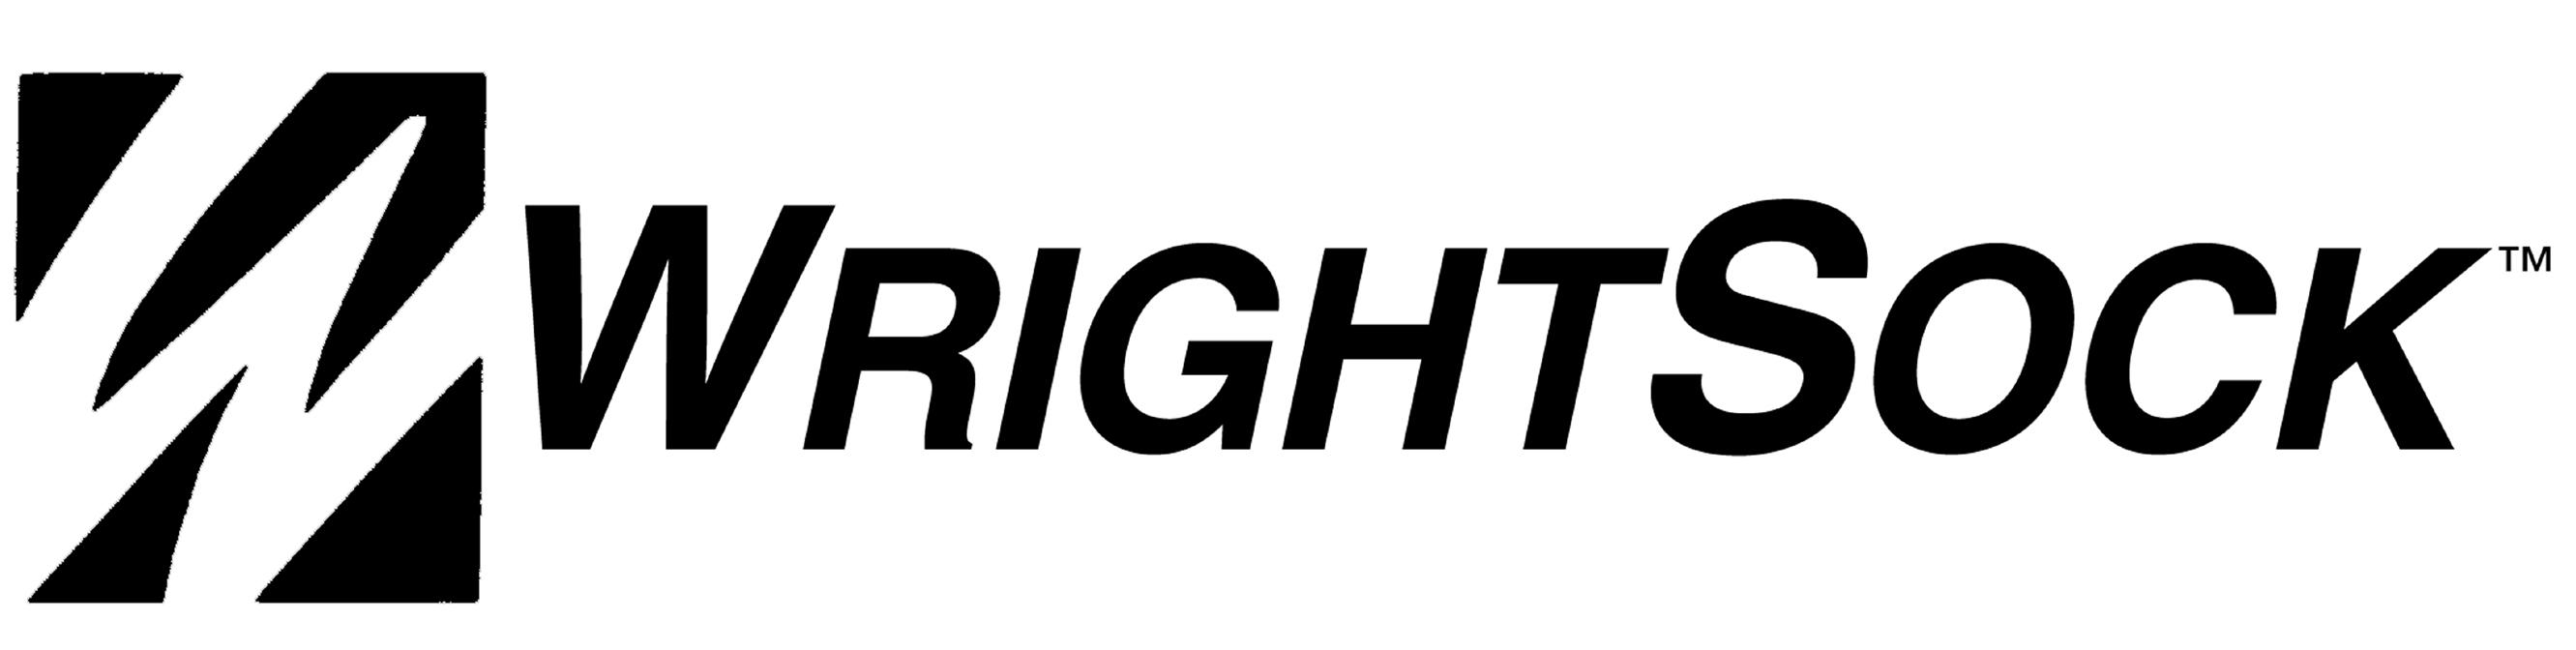 Wrightsock